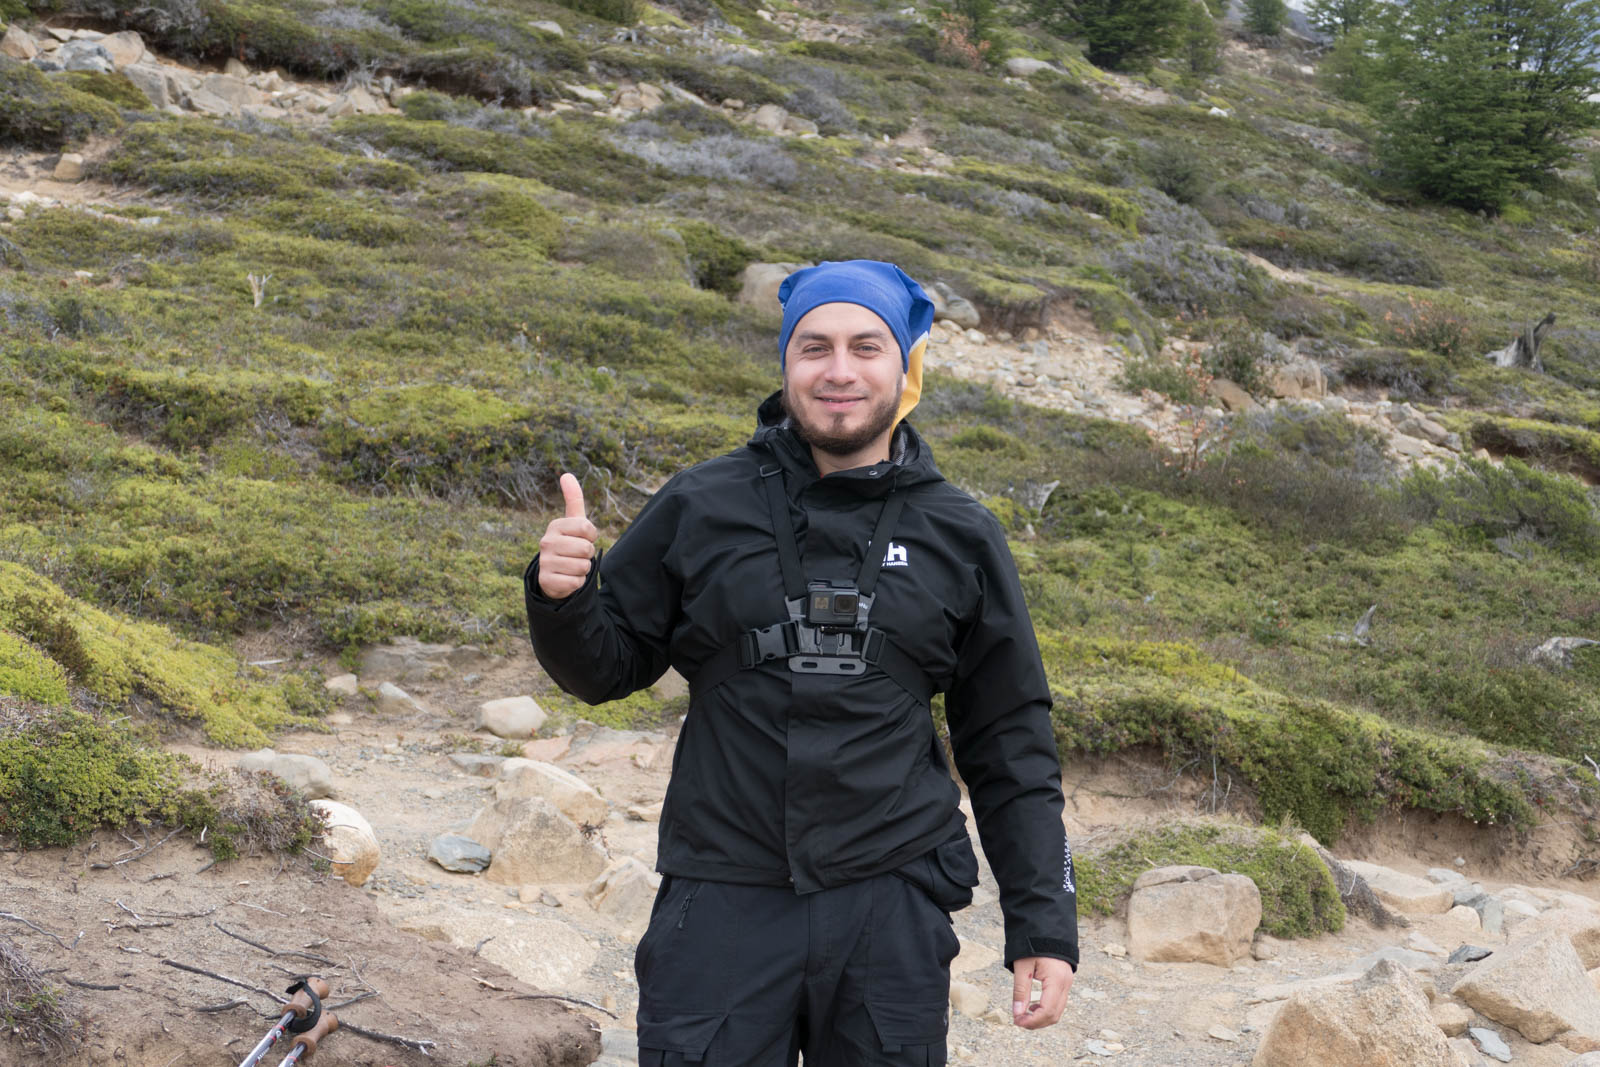 Friendly GoPro hiker